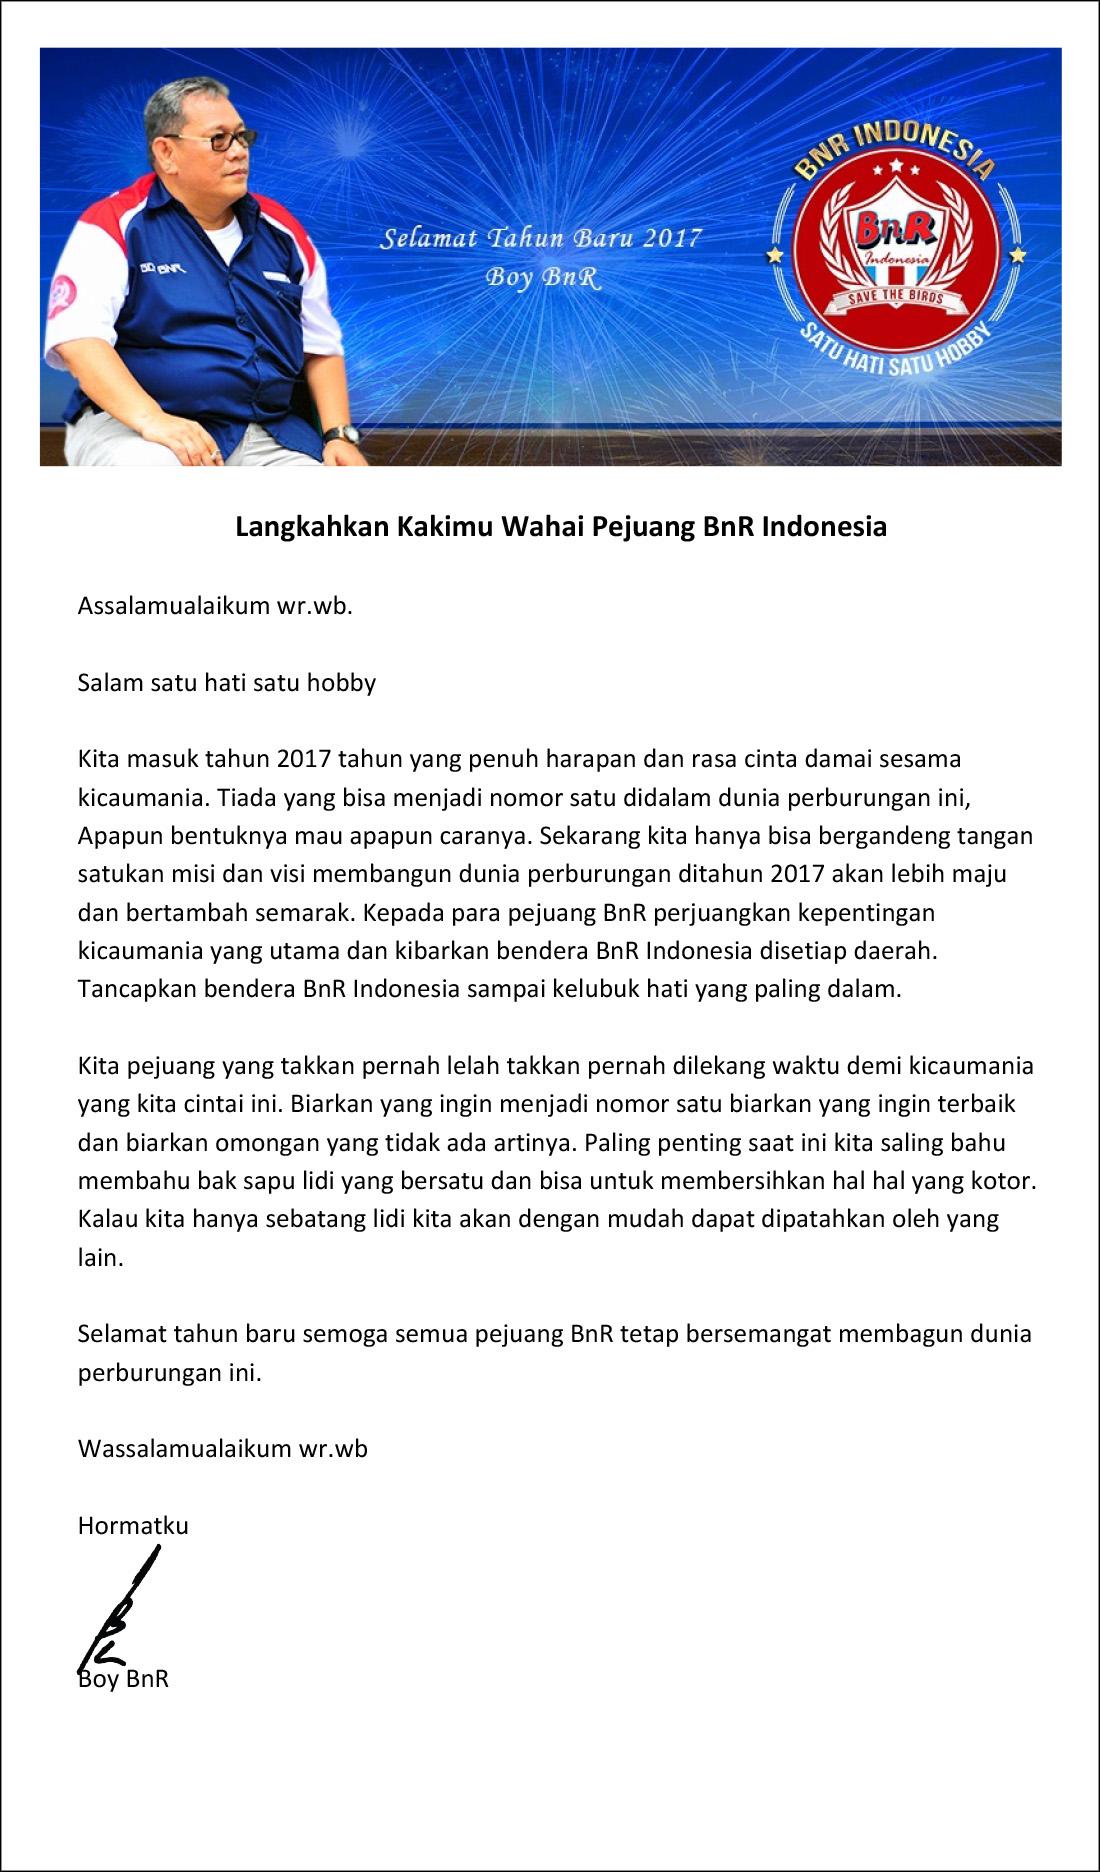 langkahkan kakimu wahai pejuang bnr indonesia